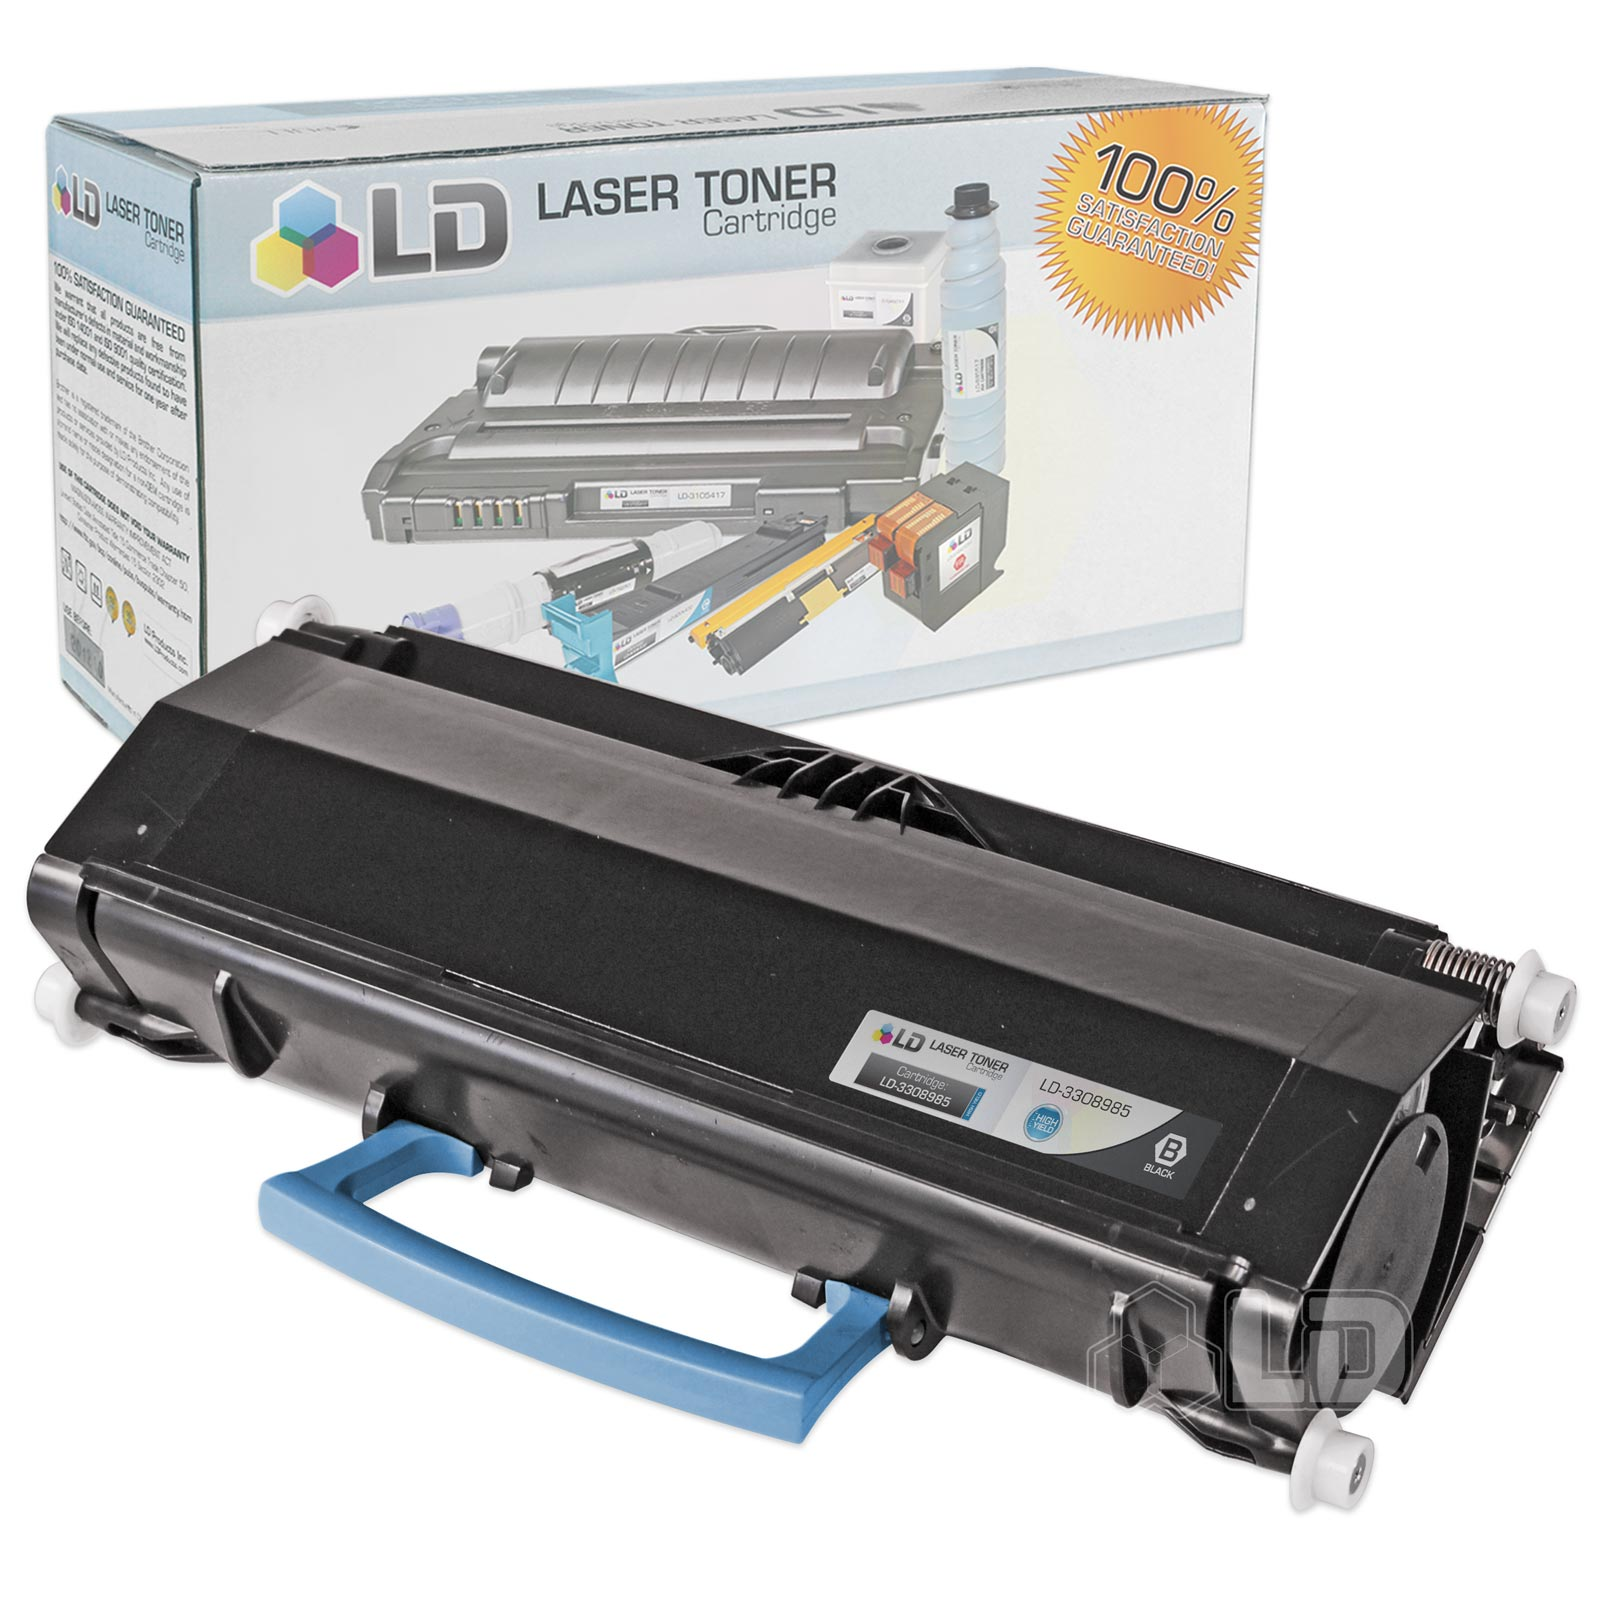 LD Refurbished 14K Page Black Toner Cartridge (GD907) for Dell 3333dn 3335dn Laser Printers